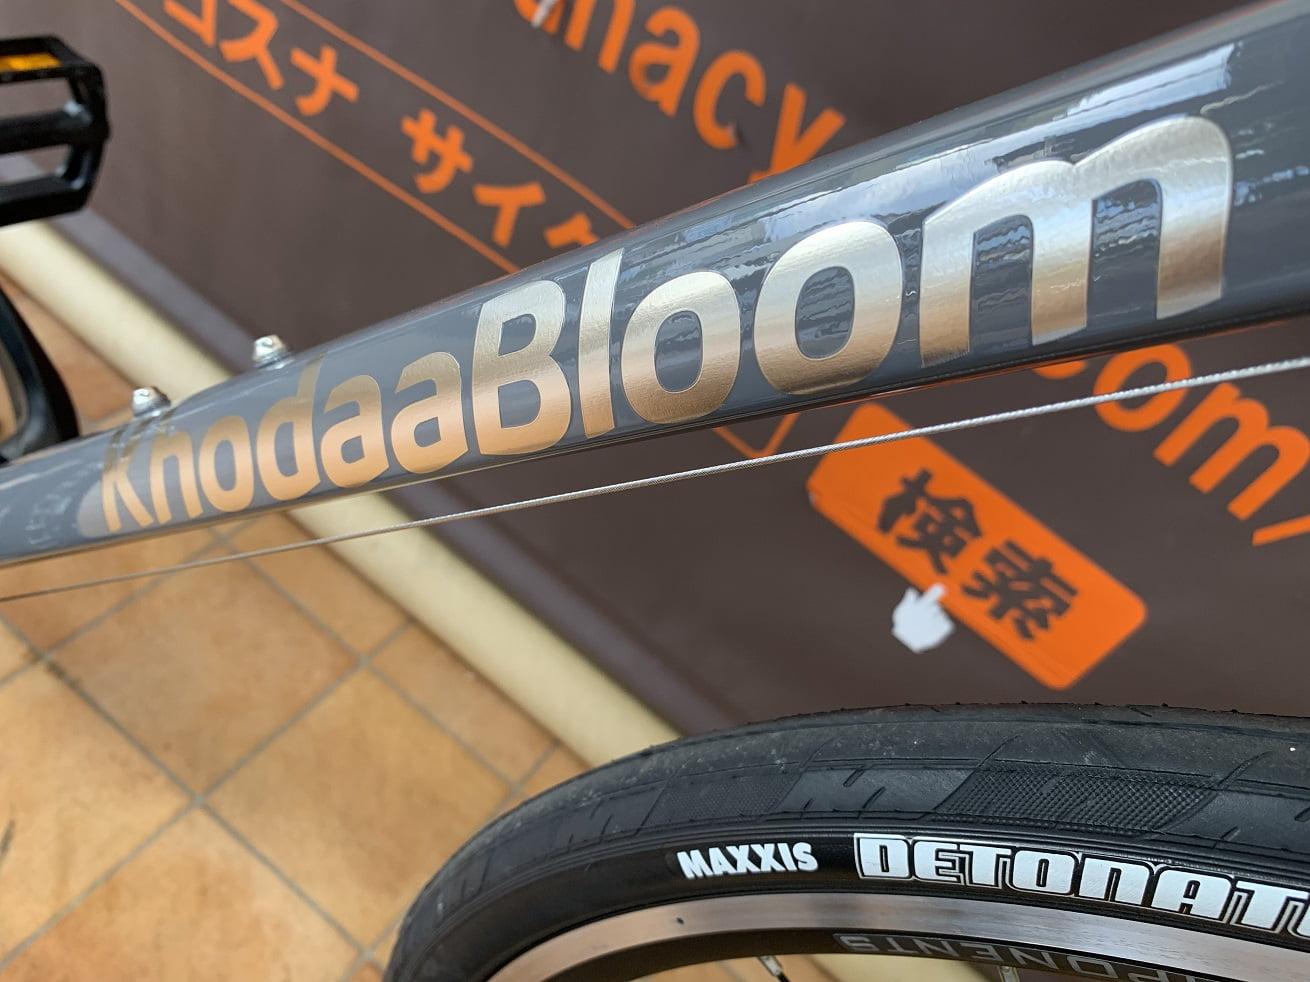 RAIL ACTIVEクロスバイクのKhodaaBloomロゴ